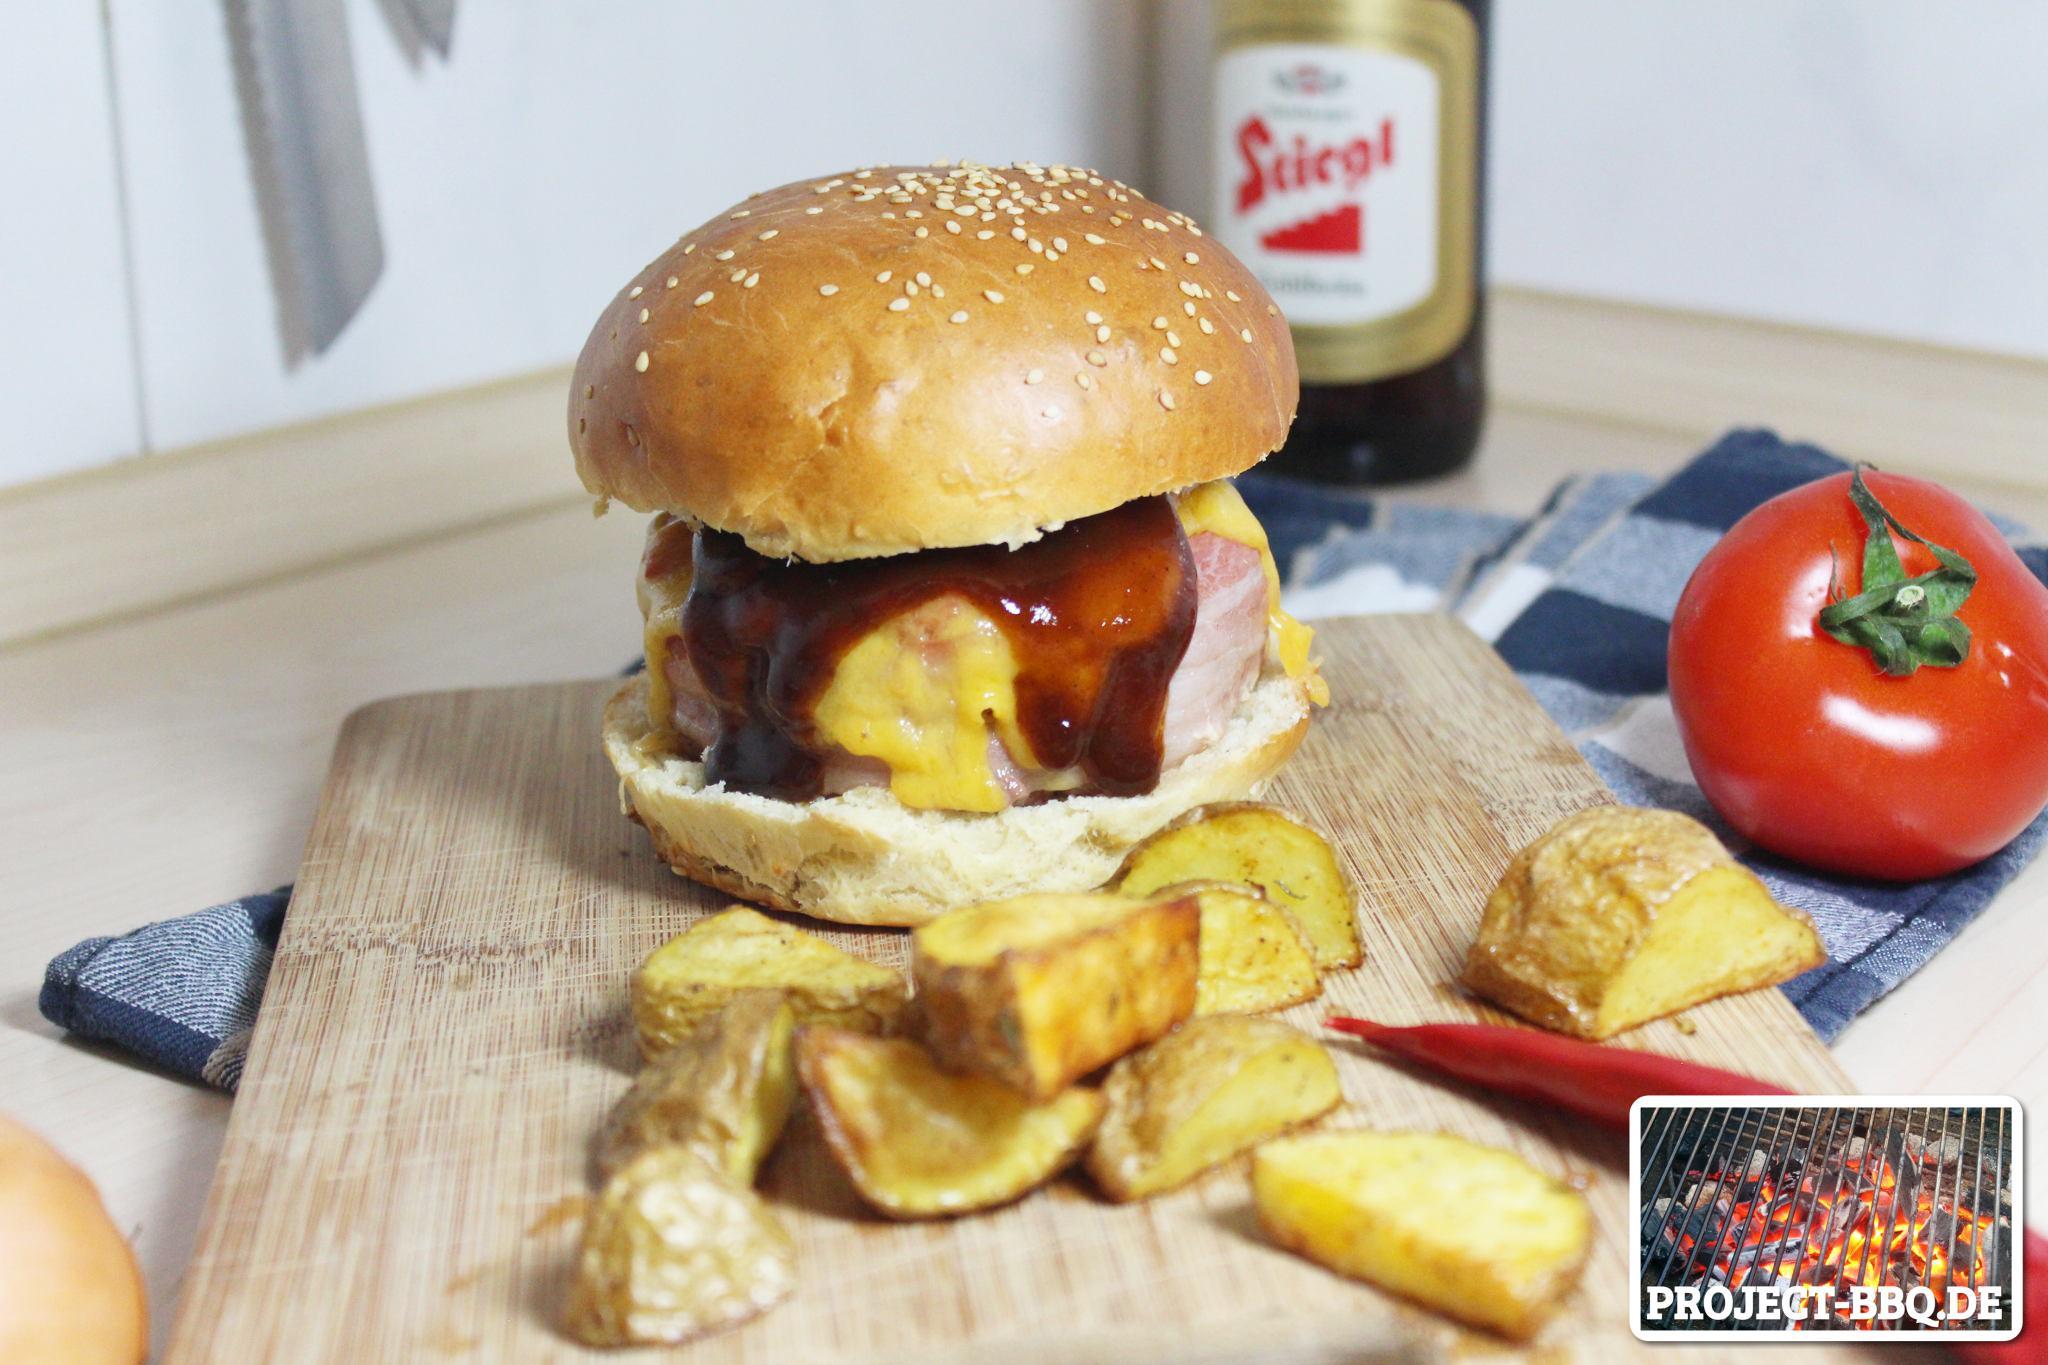 beer can burger project bbq grill barbecue blog grillrezepte und mehr. Black Bedroom Furniture Sets. Home Design Ideas